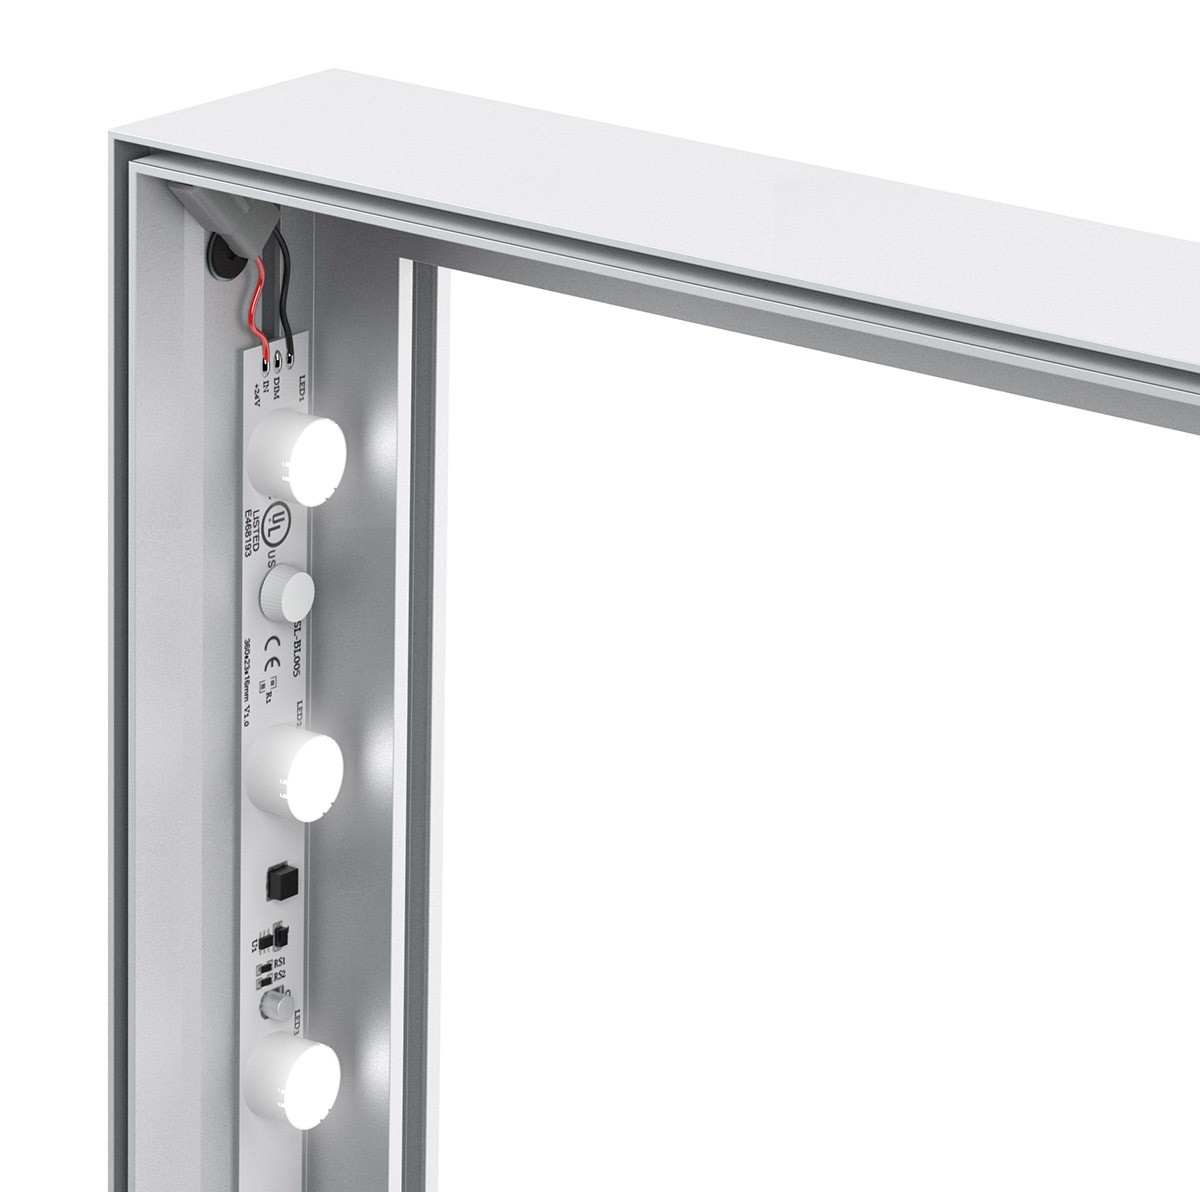 Charisma 48x96 Slim LED SEG Fabric Light Box